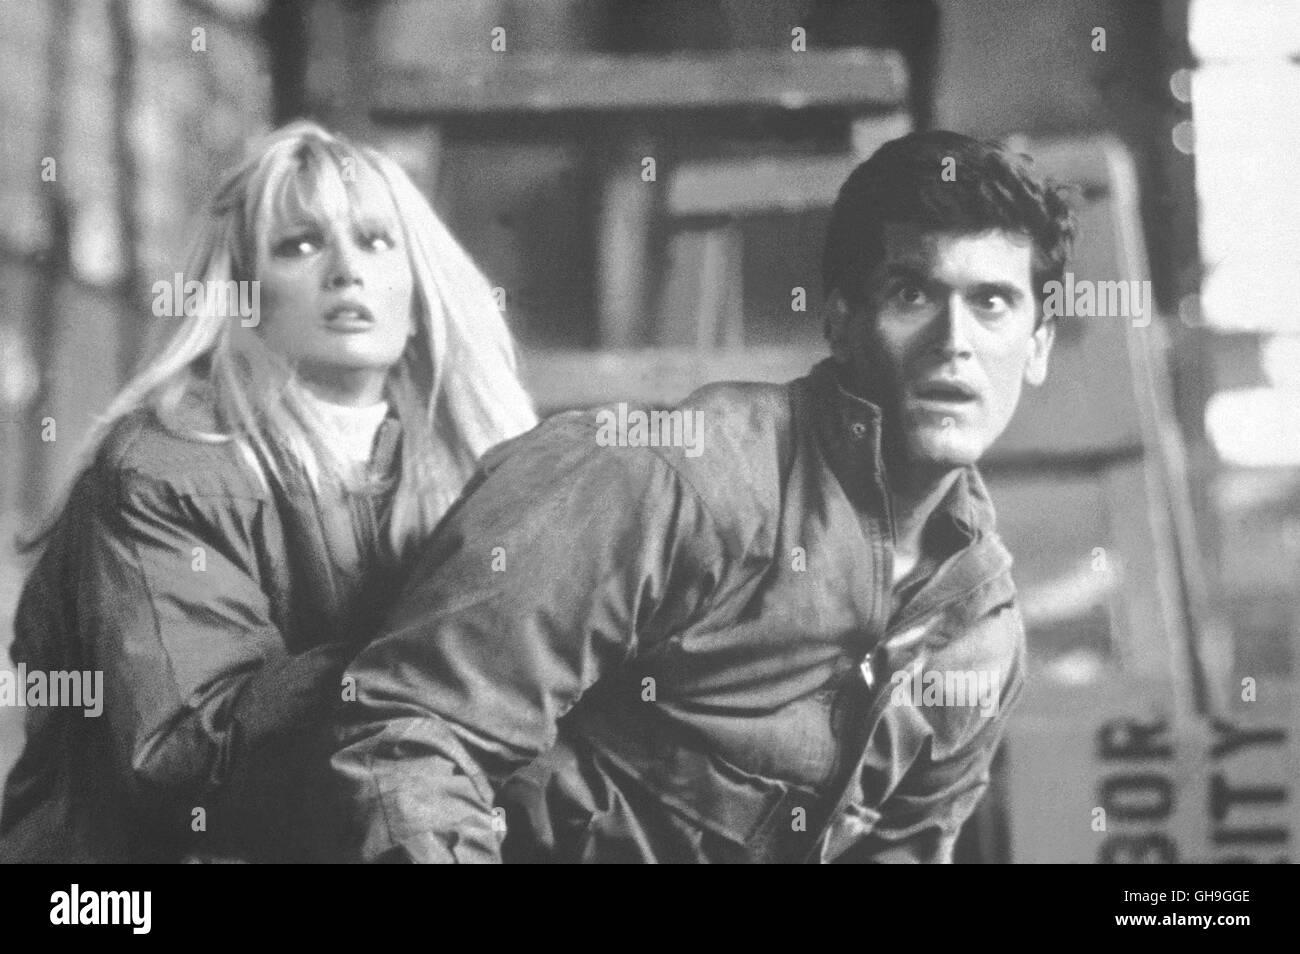 LAURENE LANDON (Theresa Mallory), TOM ATKINS (Frank McCrae) Film, Fernsehen, Horrorfilm, 80er Regie: William Lustig - Stock Image